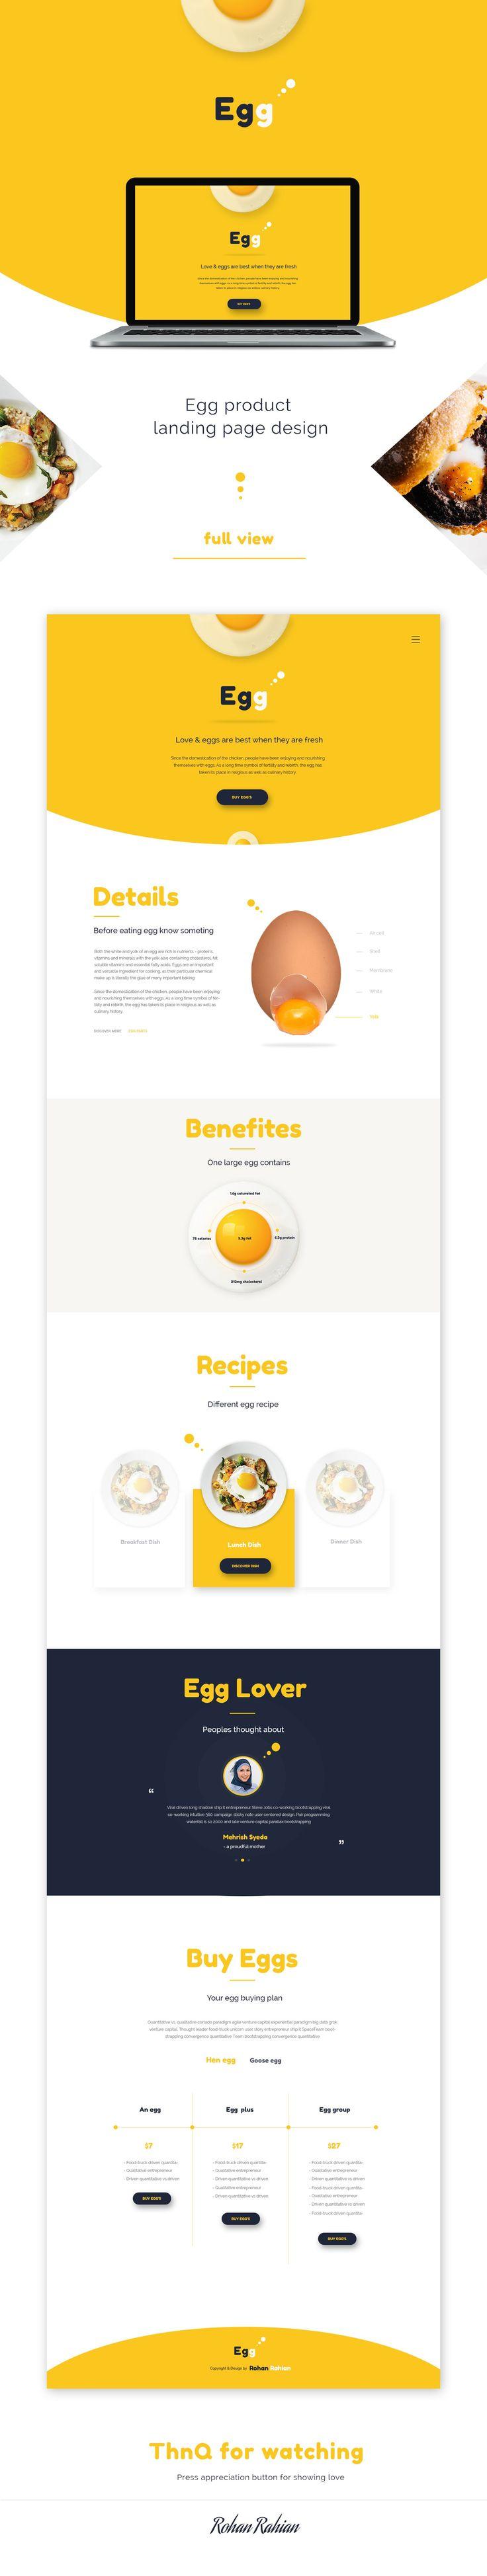 Egg - Product Landing Page Design by Rohan Rahian - https://www.designideas.pics/egg-product-landing-page-design-rohan-rahian/